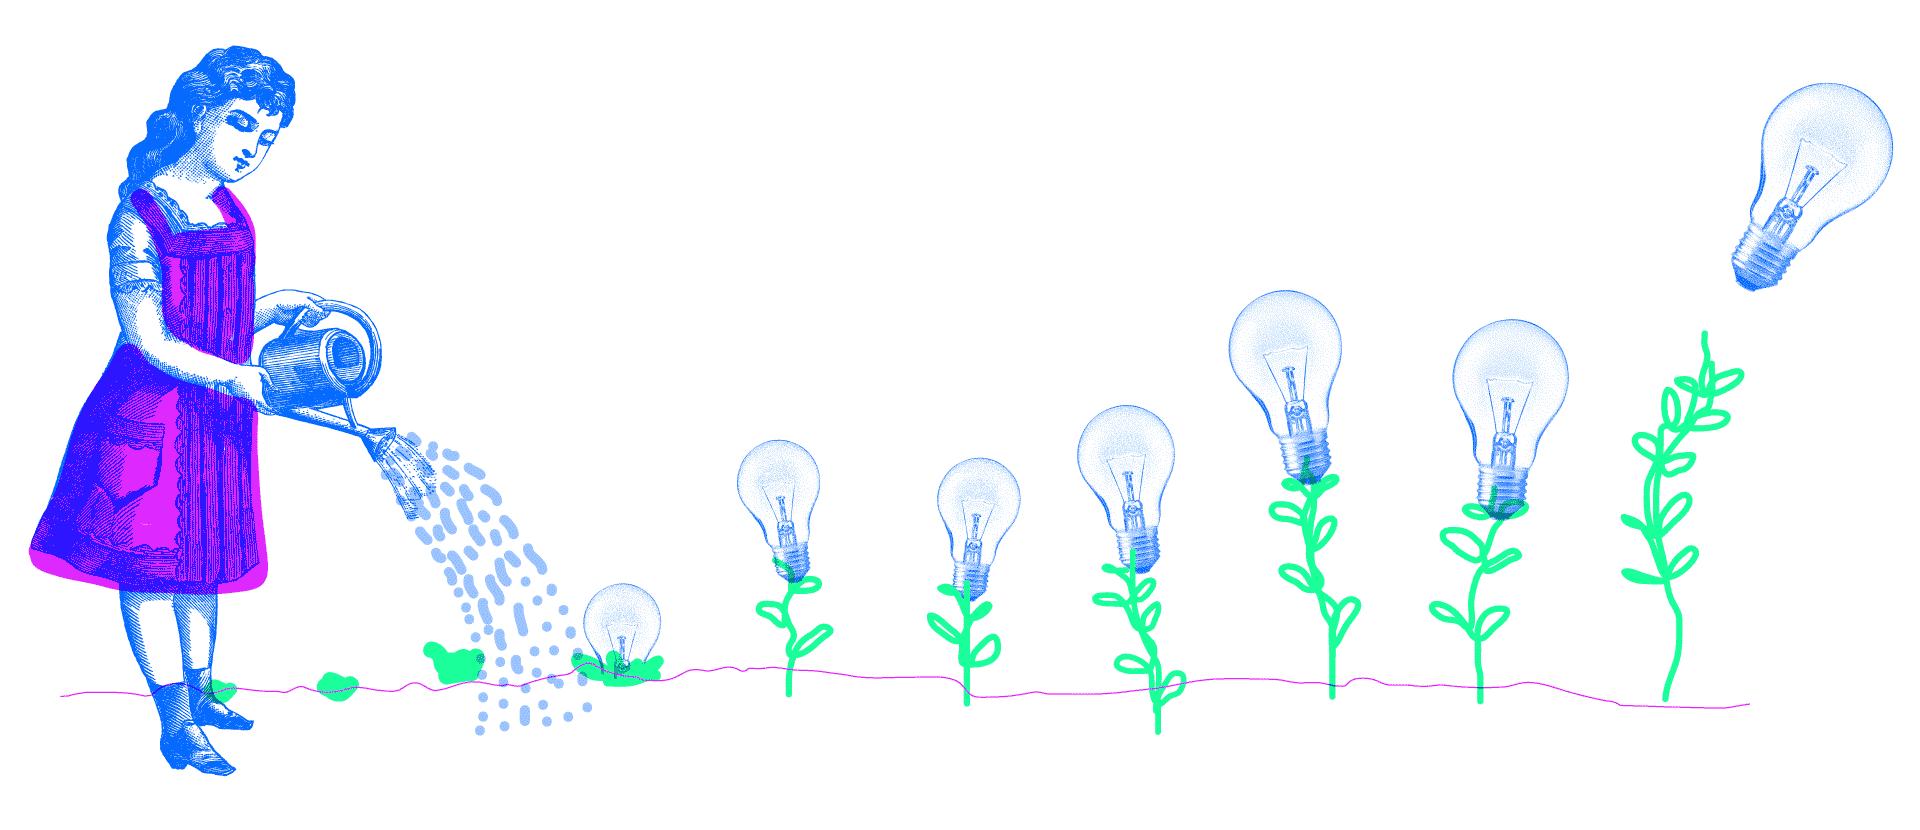 Idé- og konseptutvikling